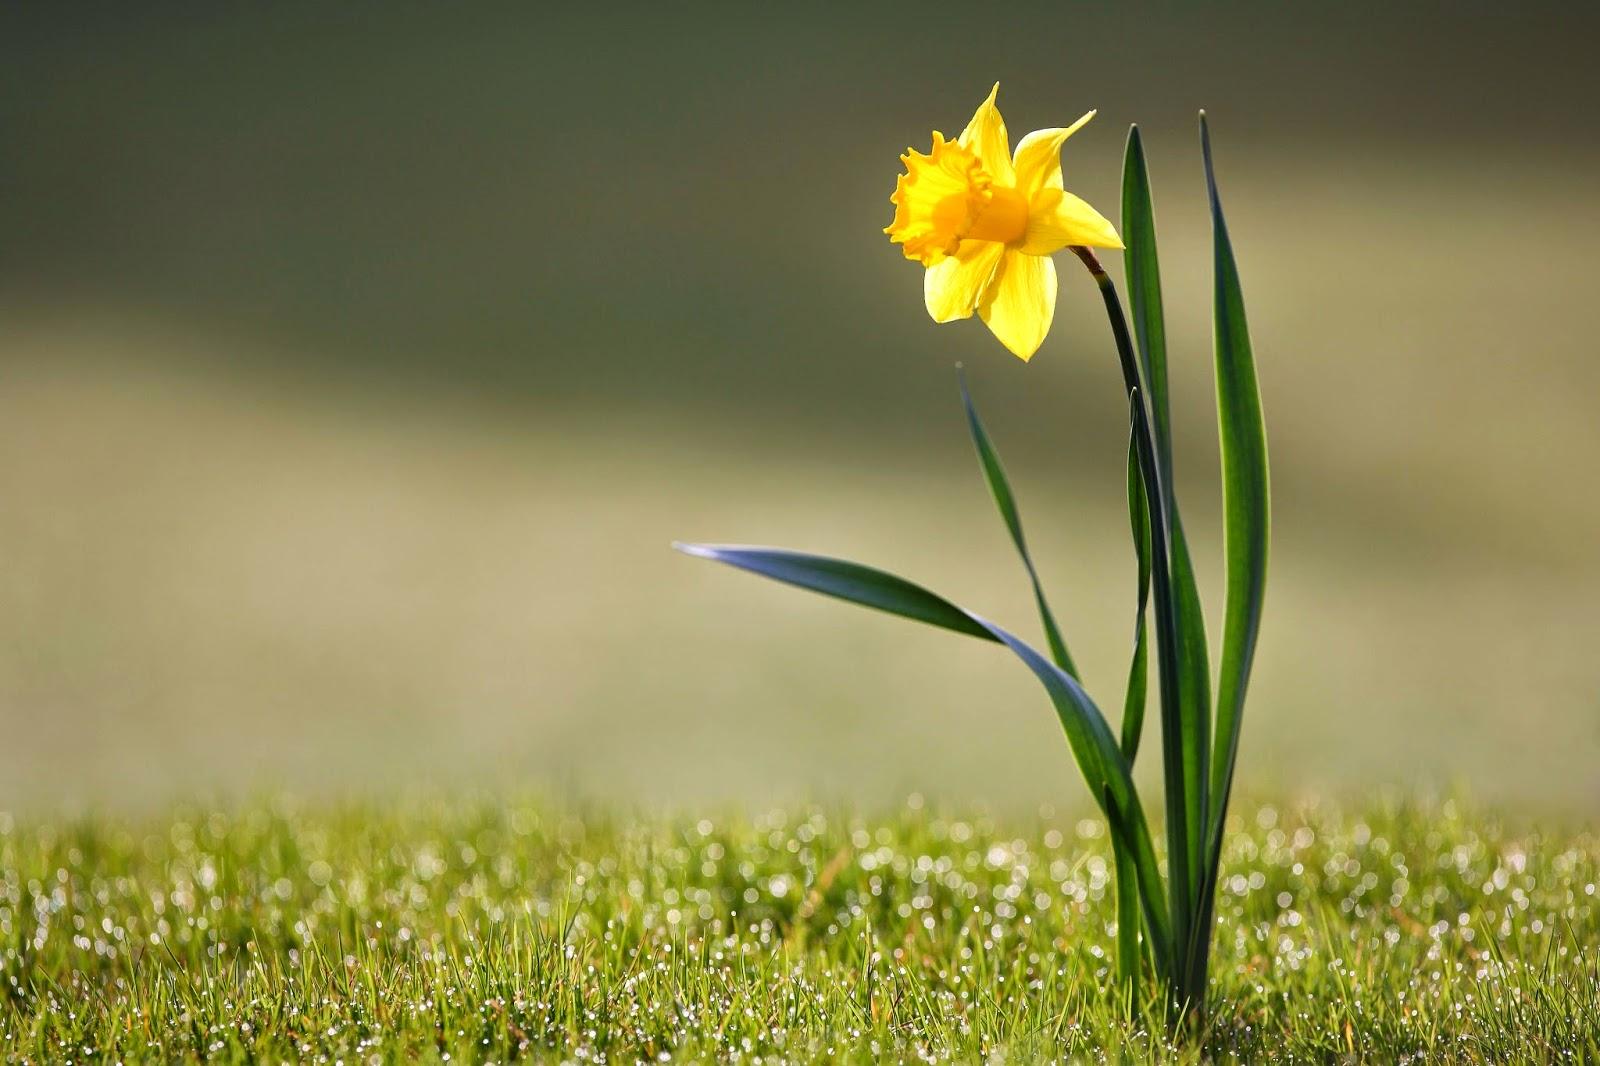 Zanna Mackenzie The Hidden Meaning Flowers